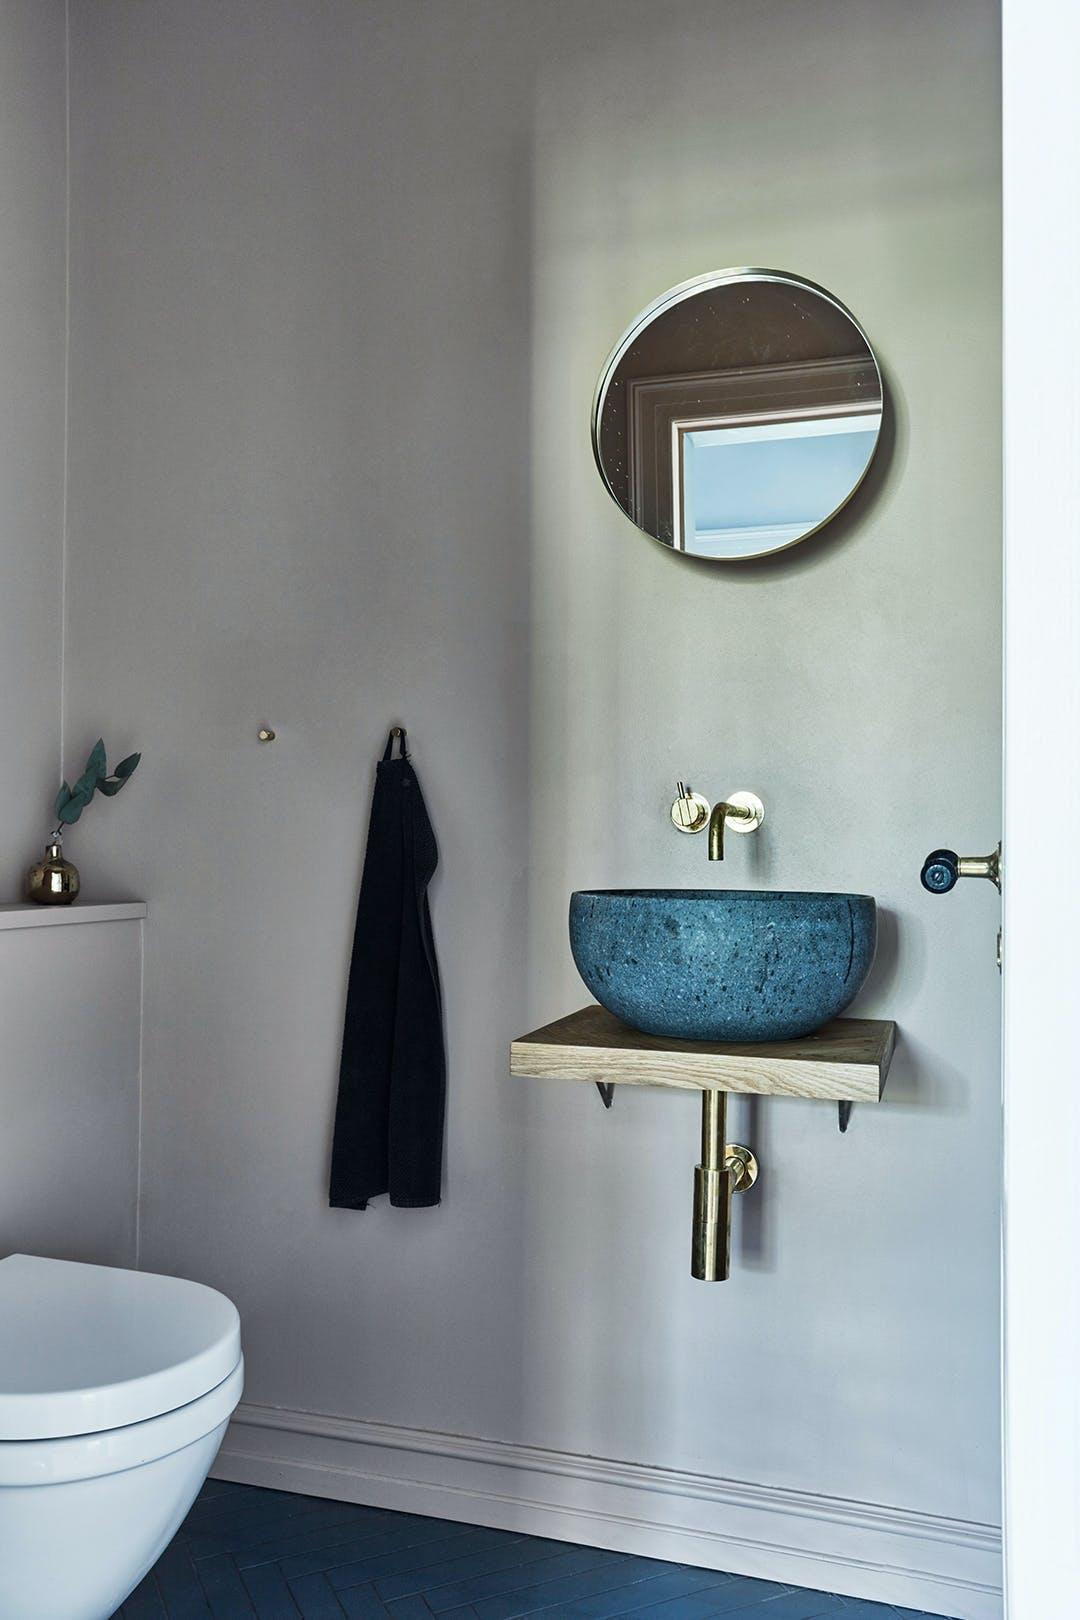 Gæstetoilet lavasten håndvask messing armatur